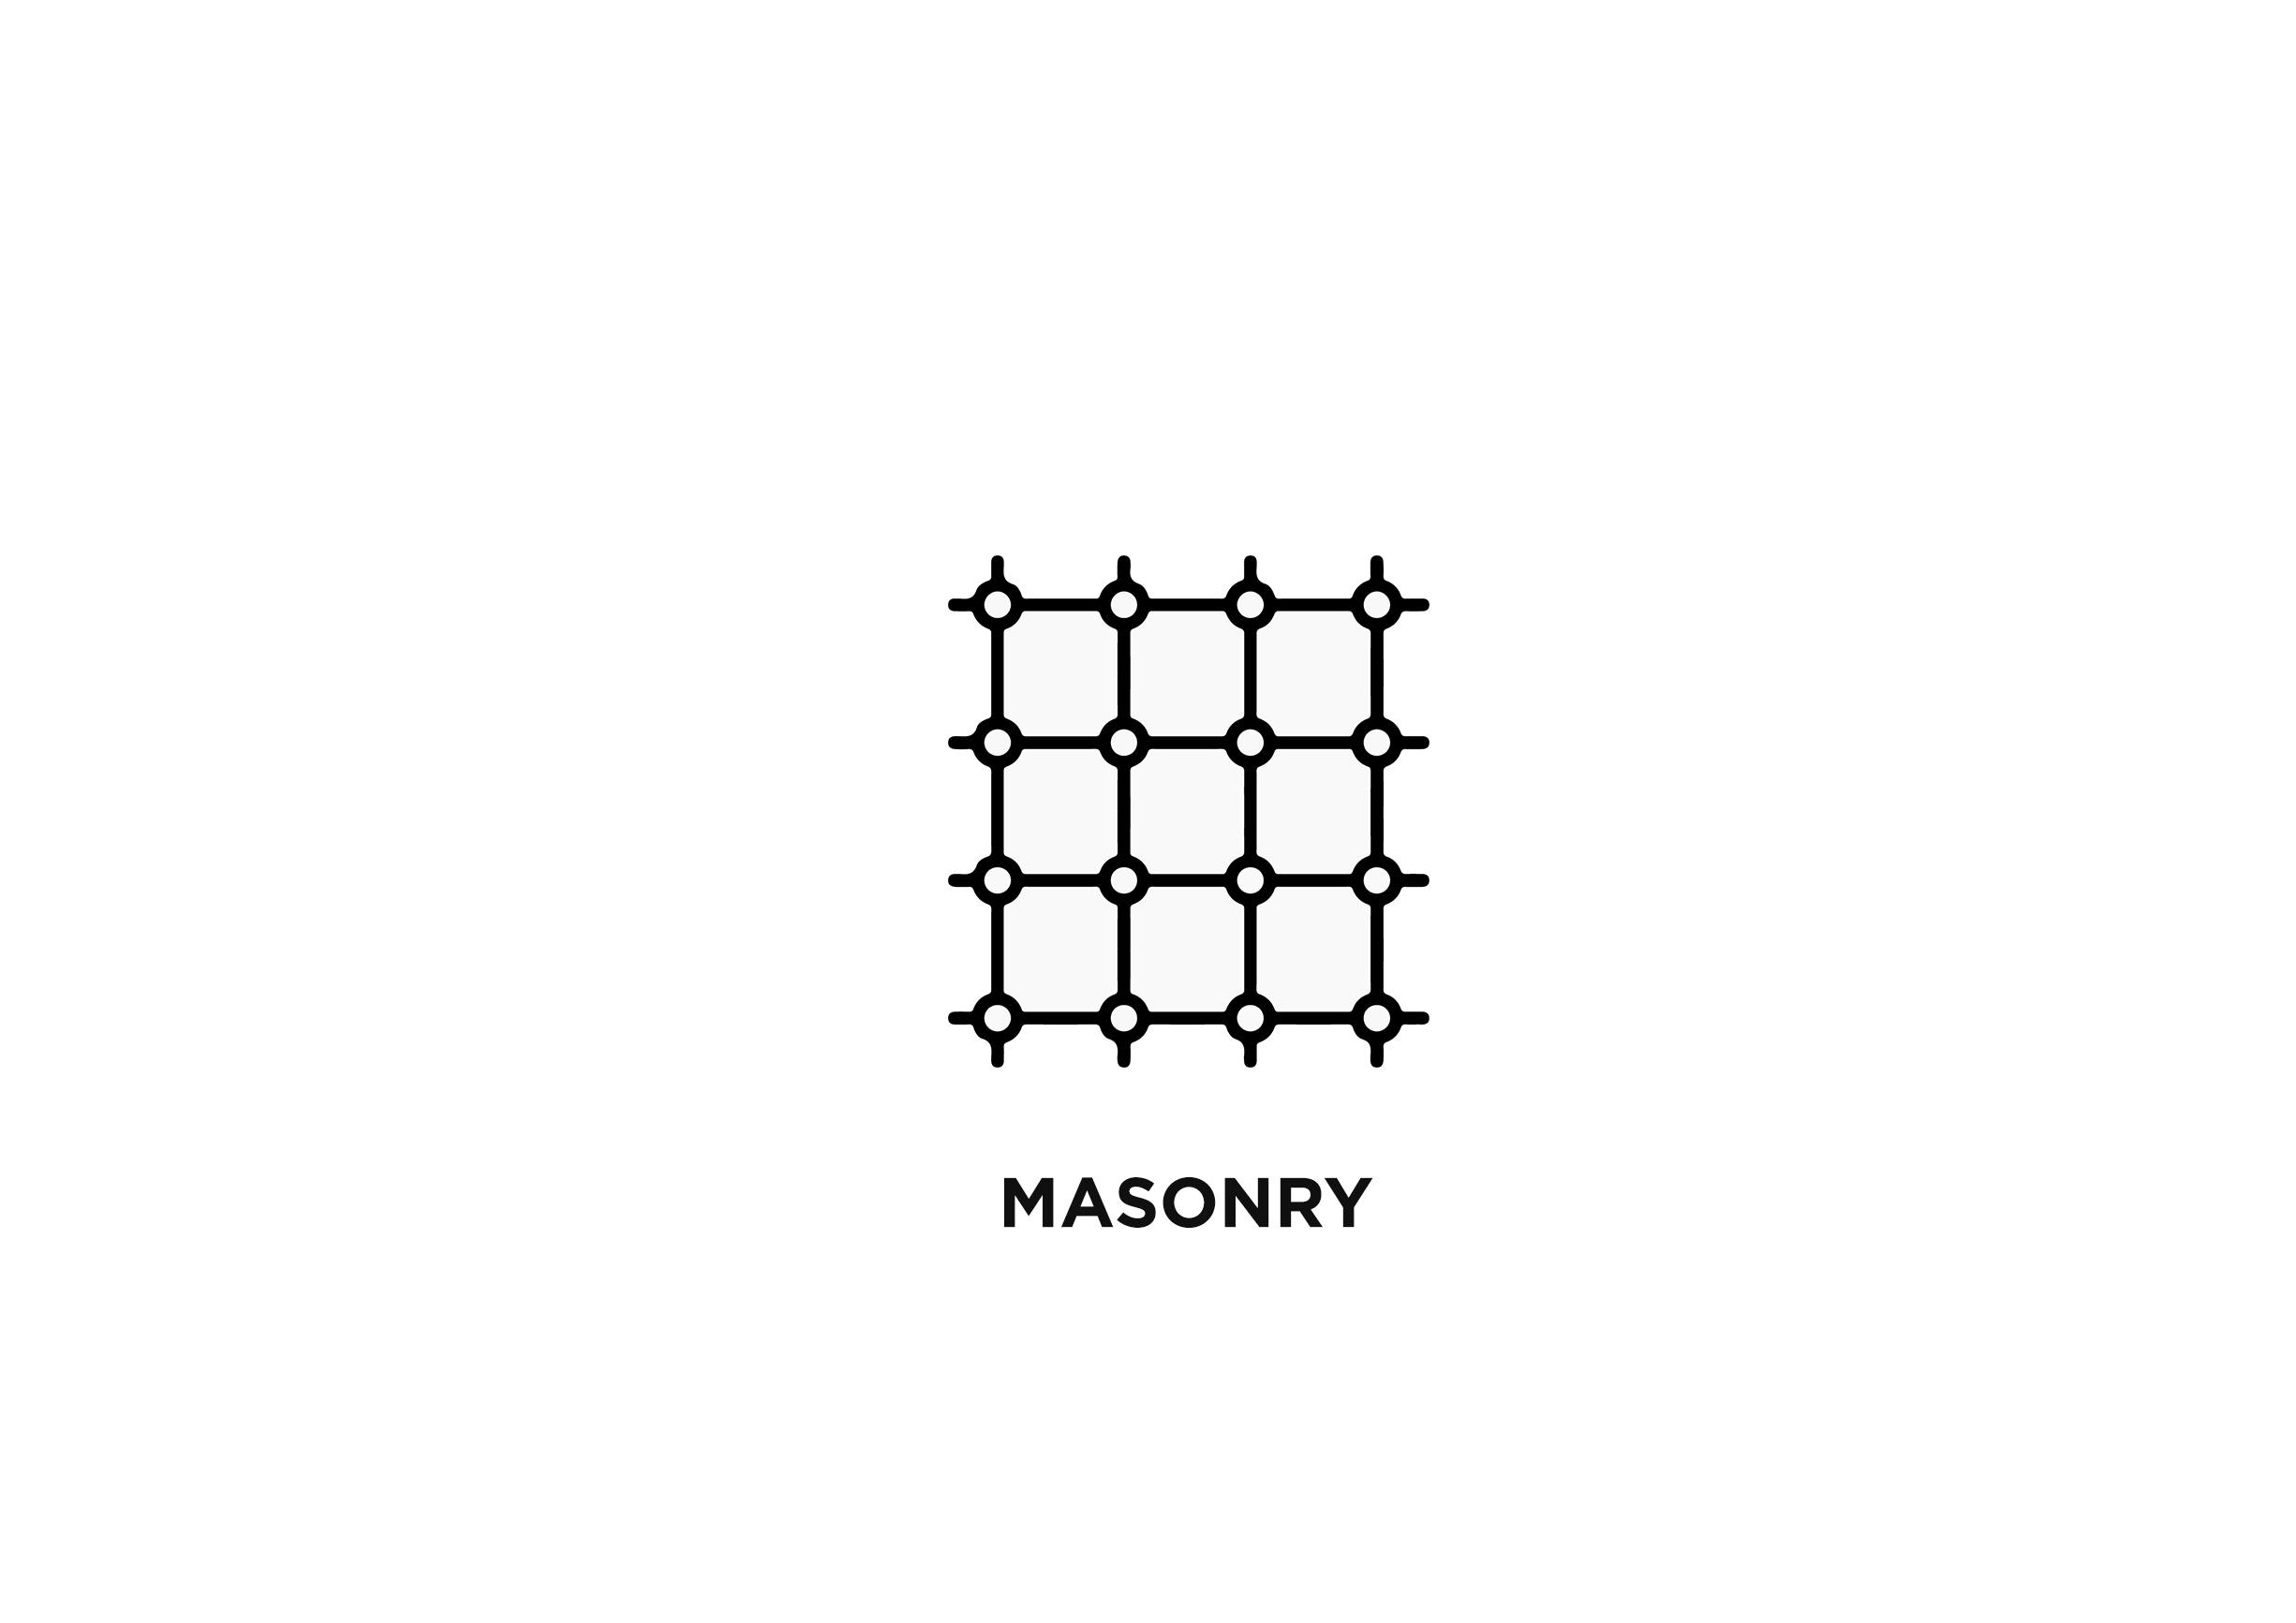 masonryforweb.jpg